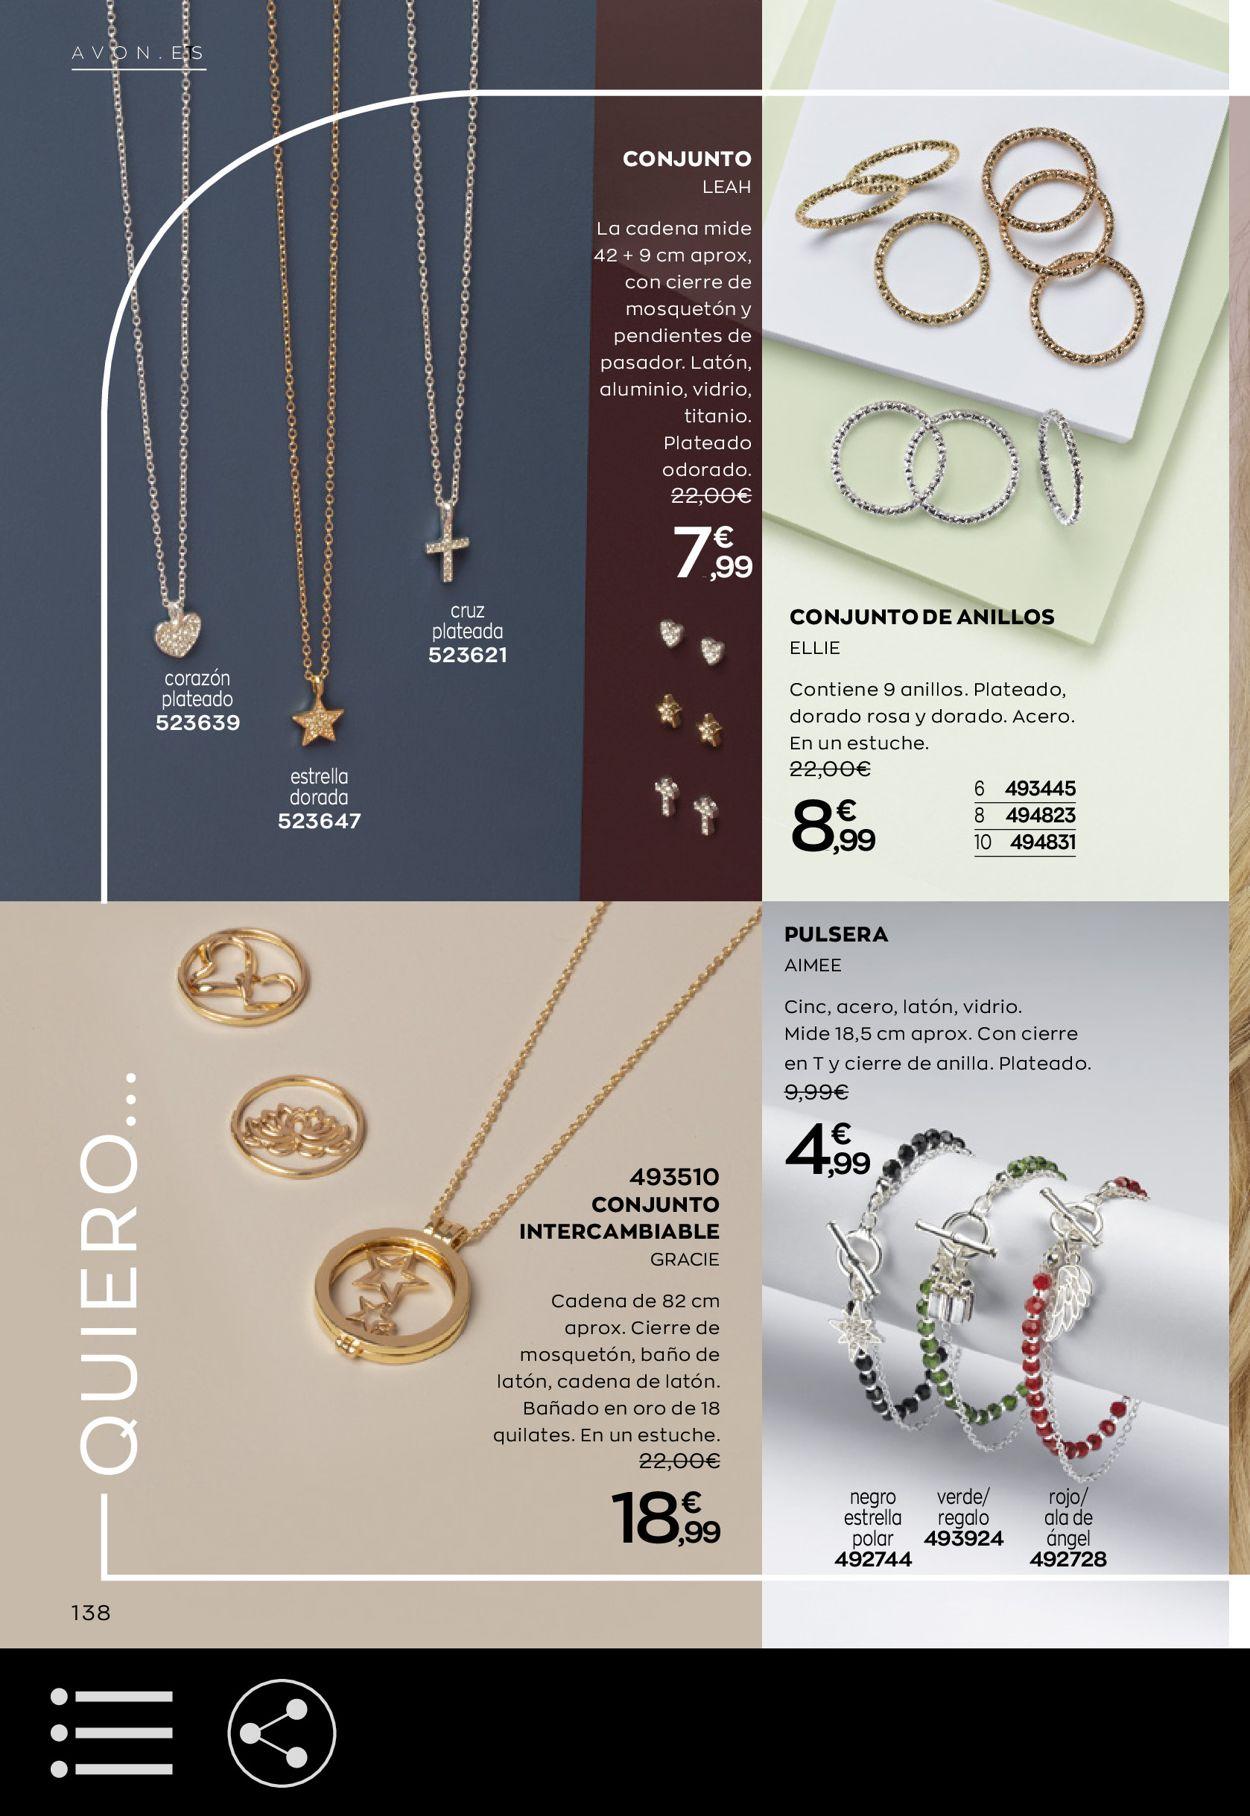 Avon Folleto - 12.09-01.10.2020 (Página 138)